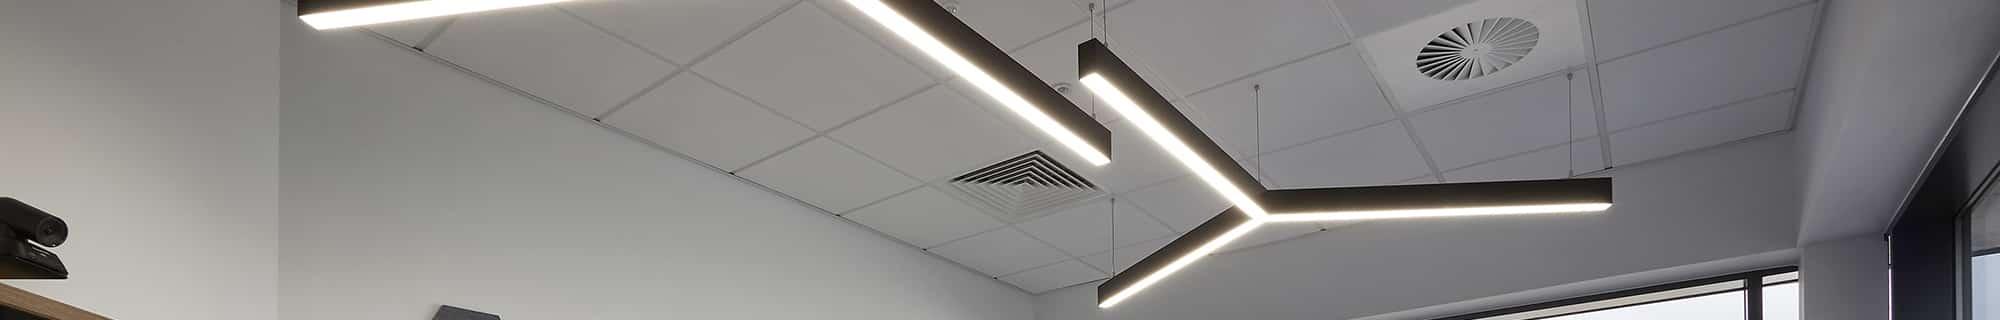 suspended lighting